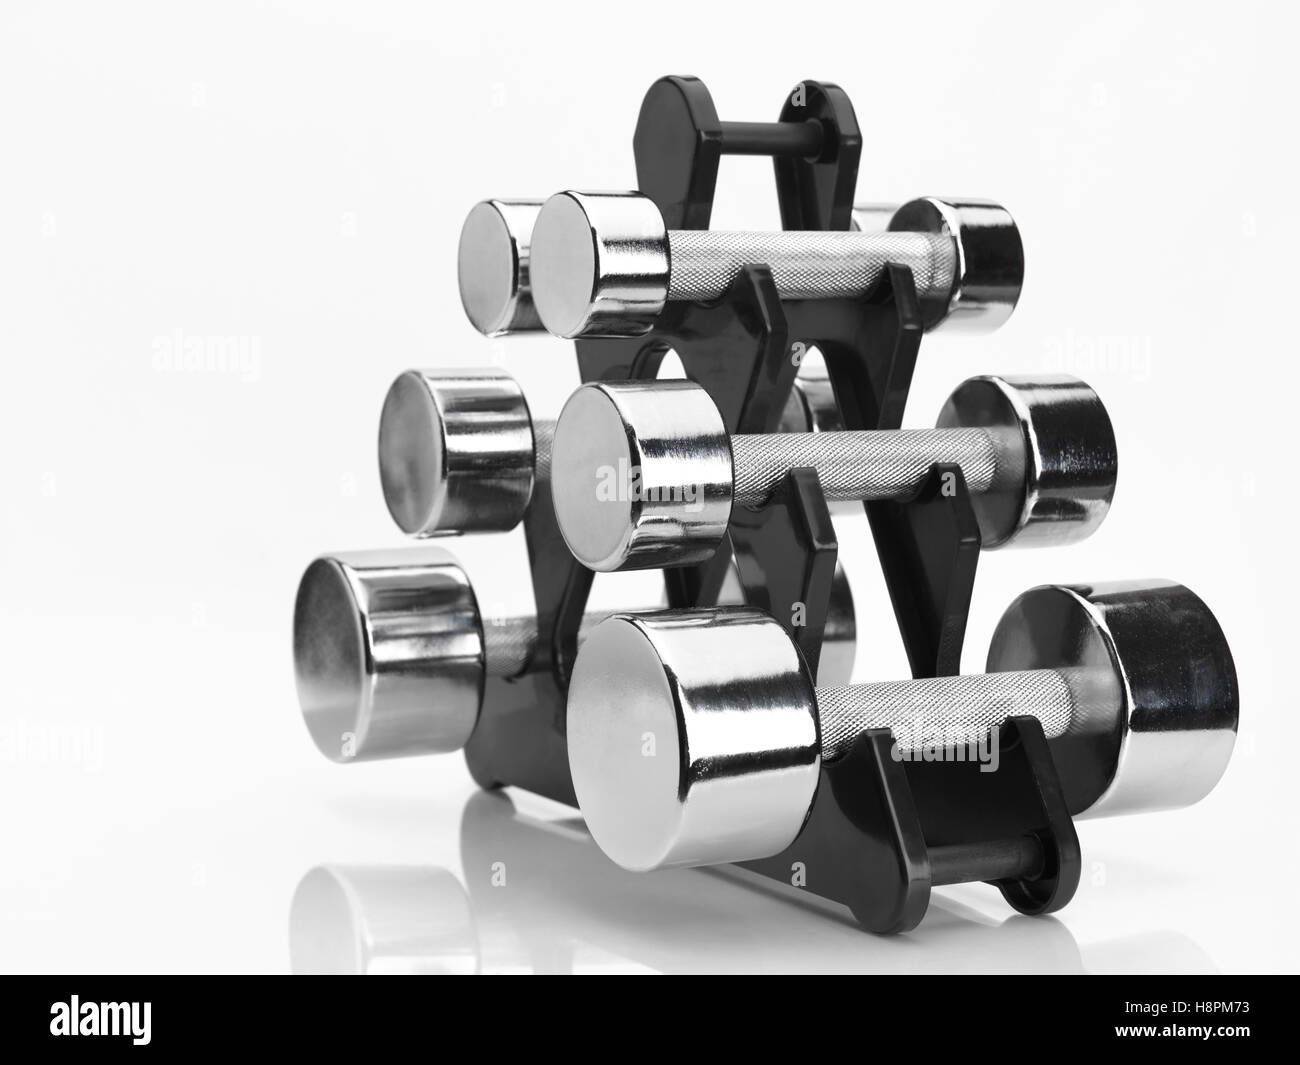 Rack with a set of shiny chrome dumbbells - Stock Image